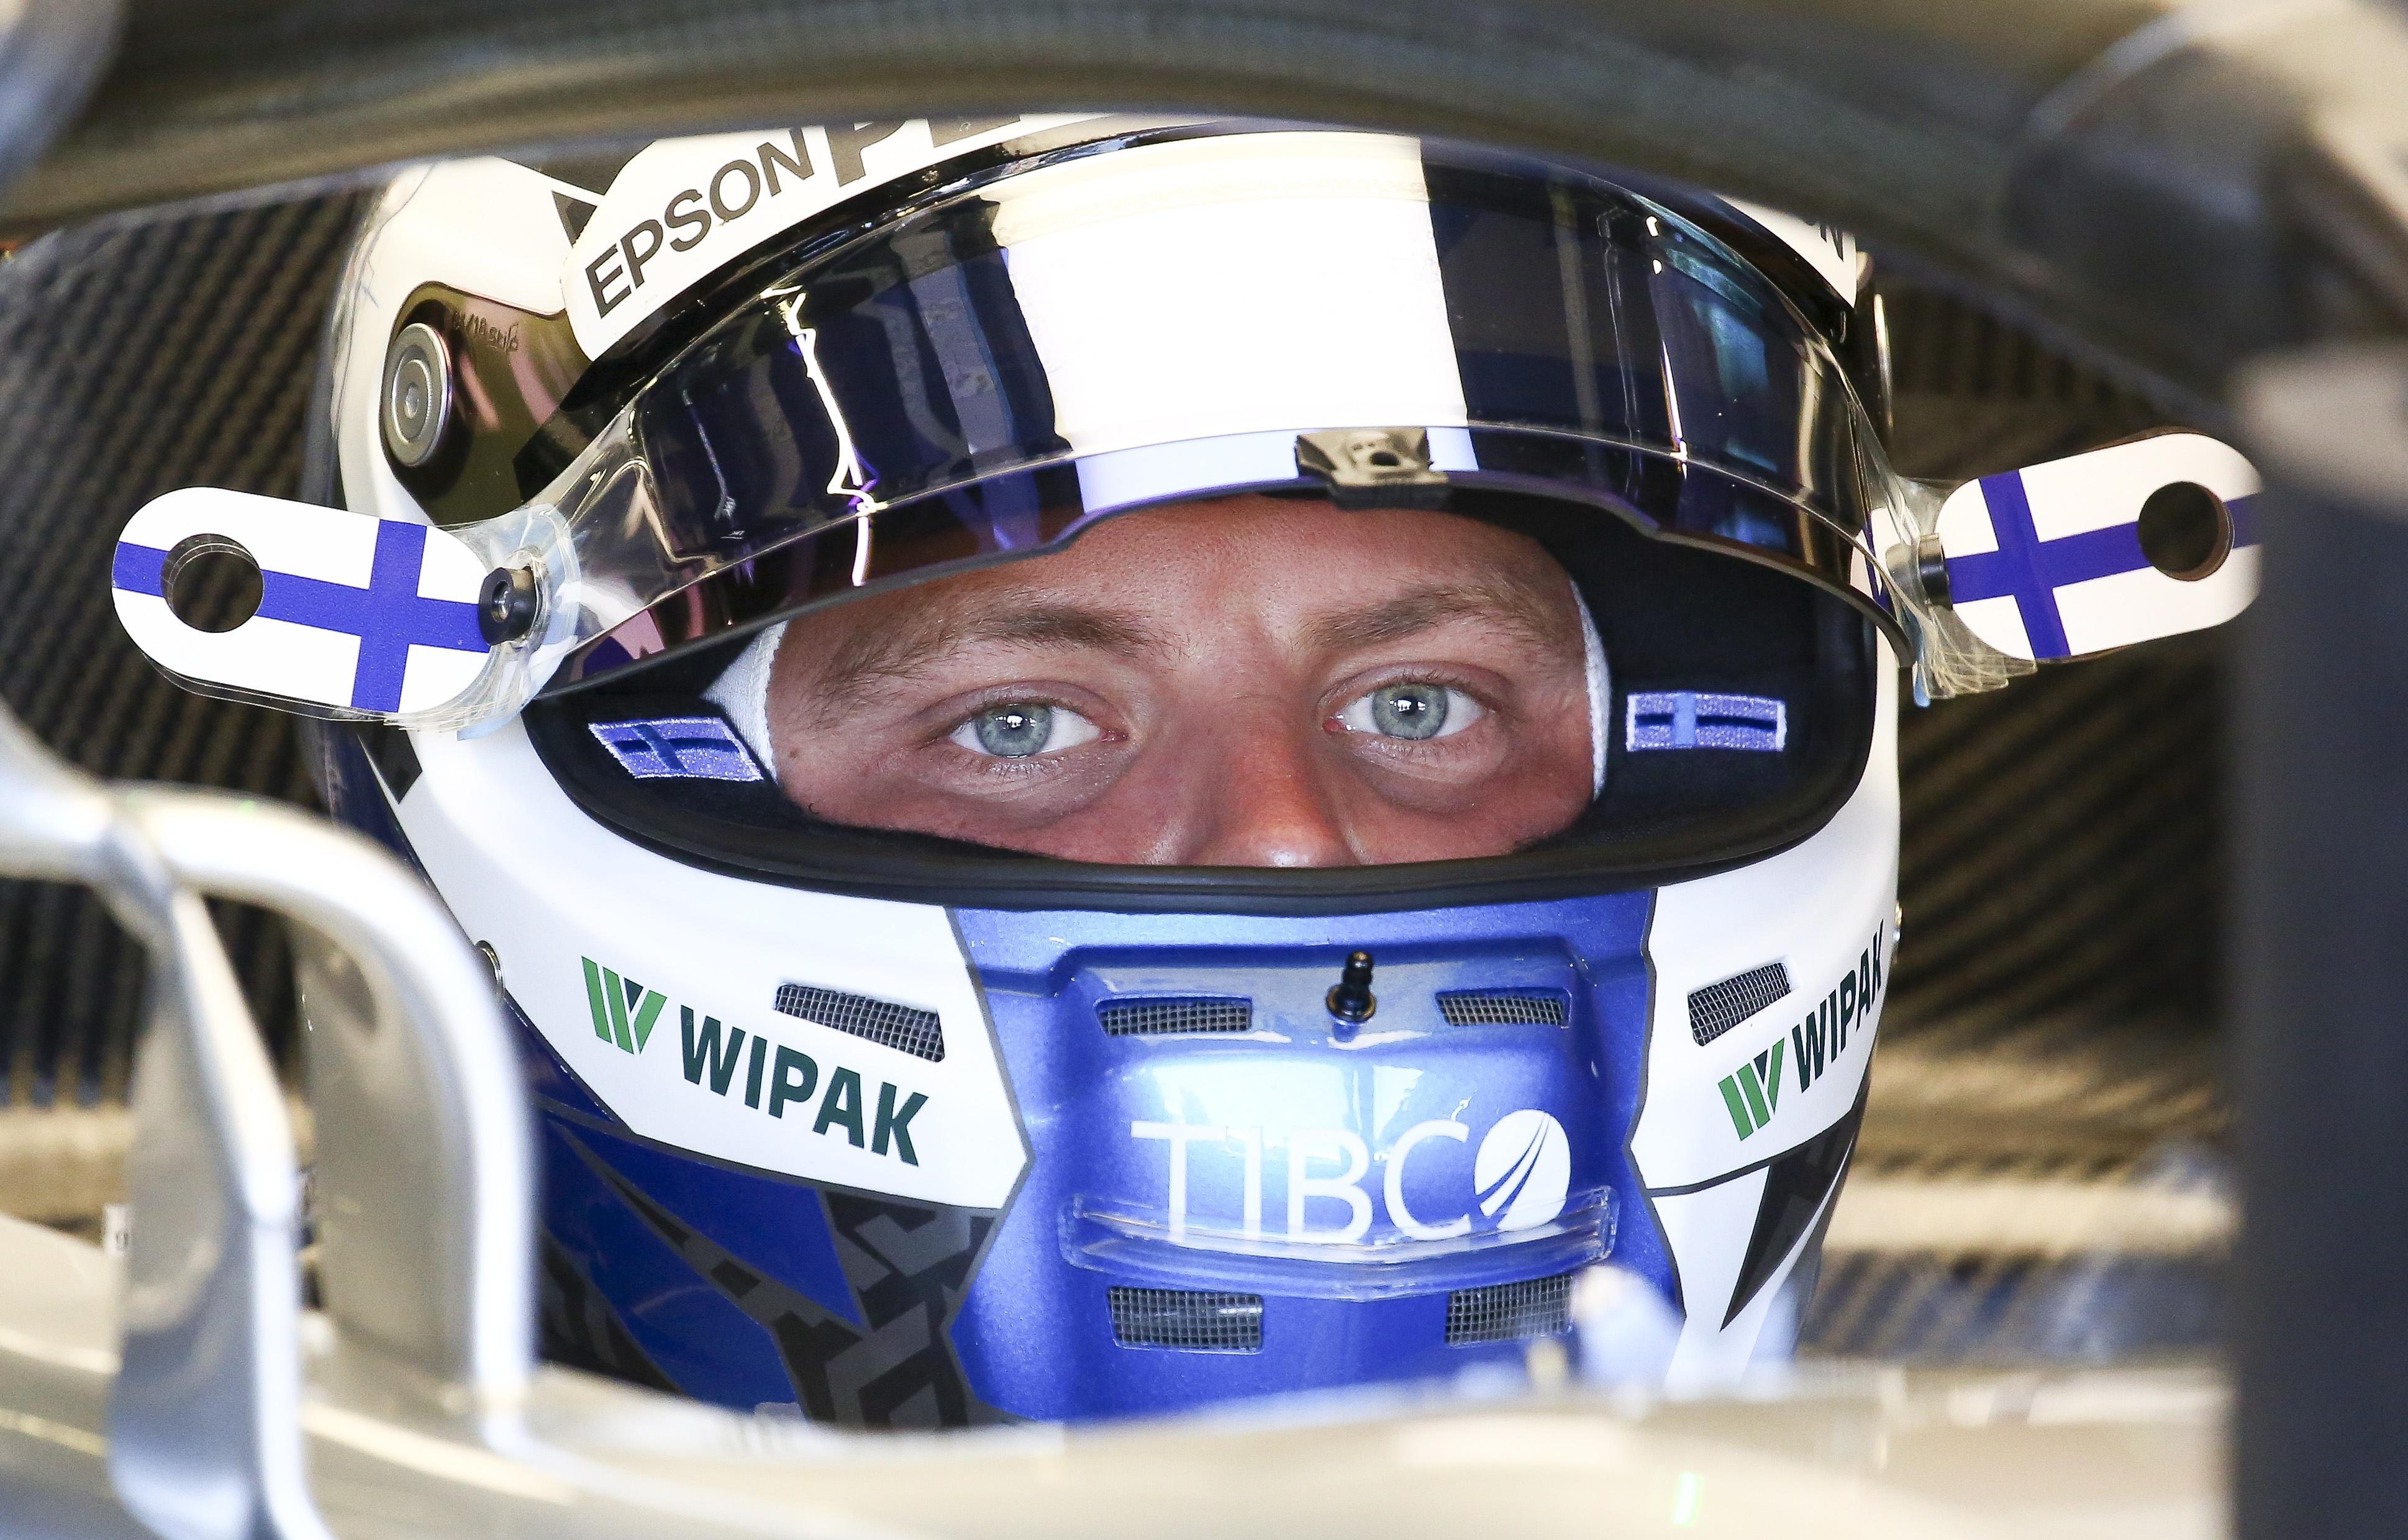 Valtteri Bottas has three Grand Prix wins since joining Mercedes